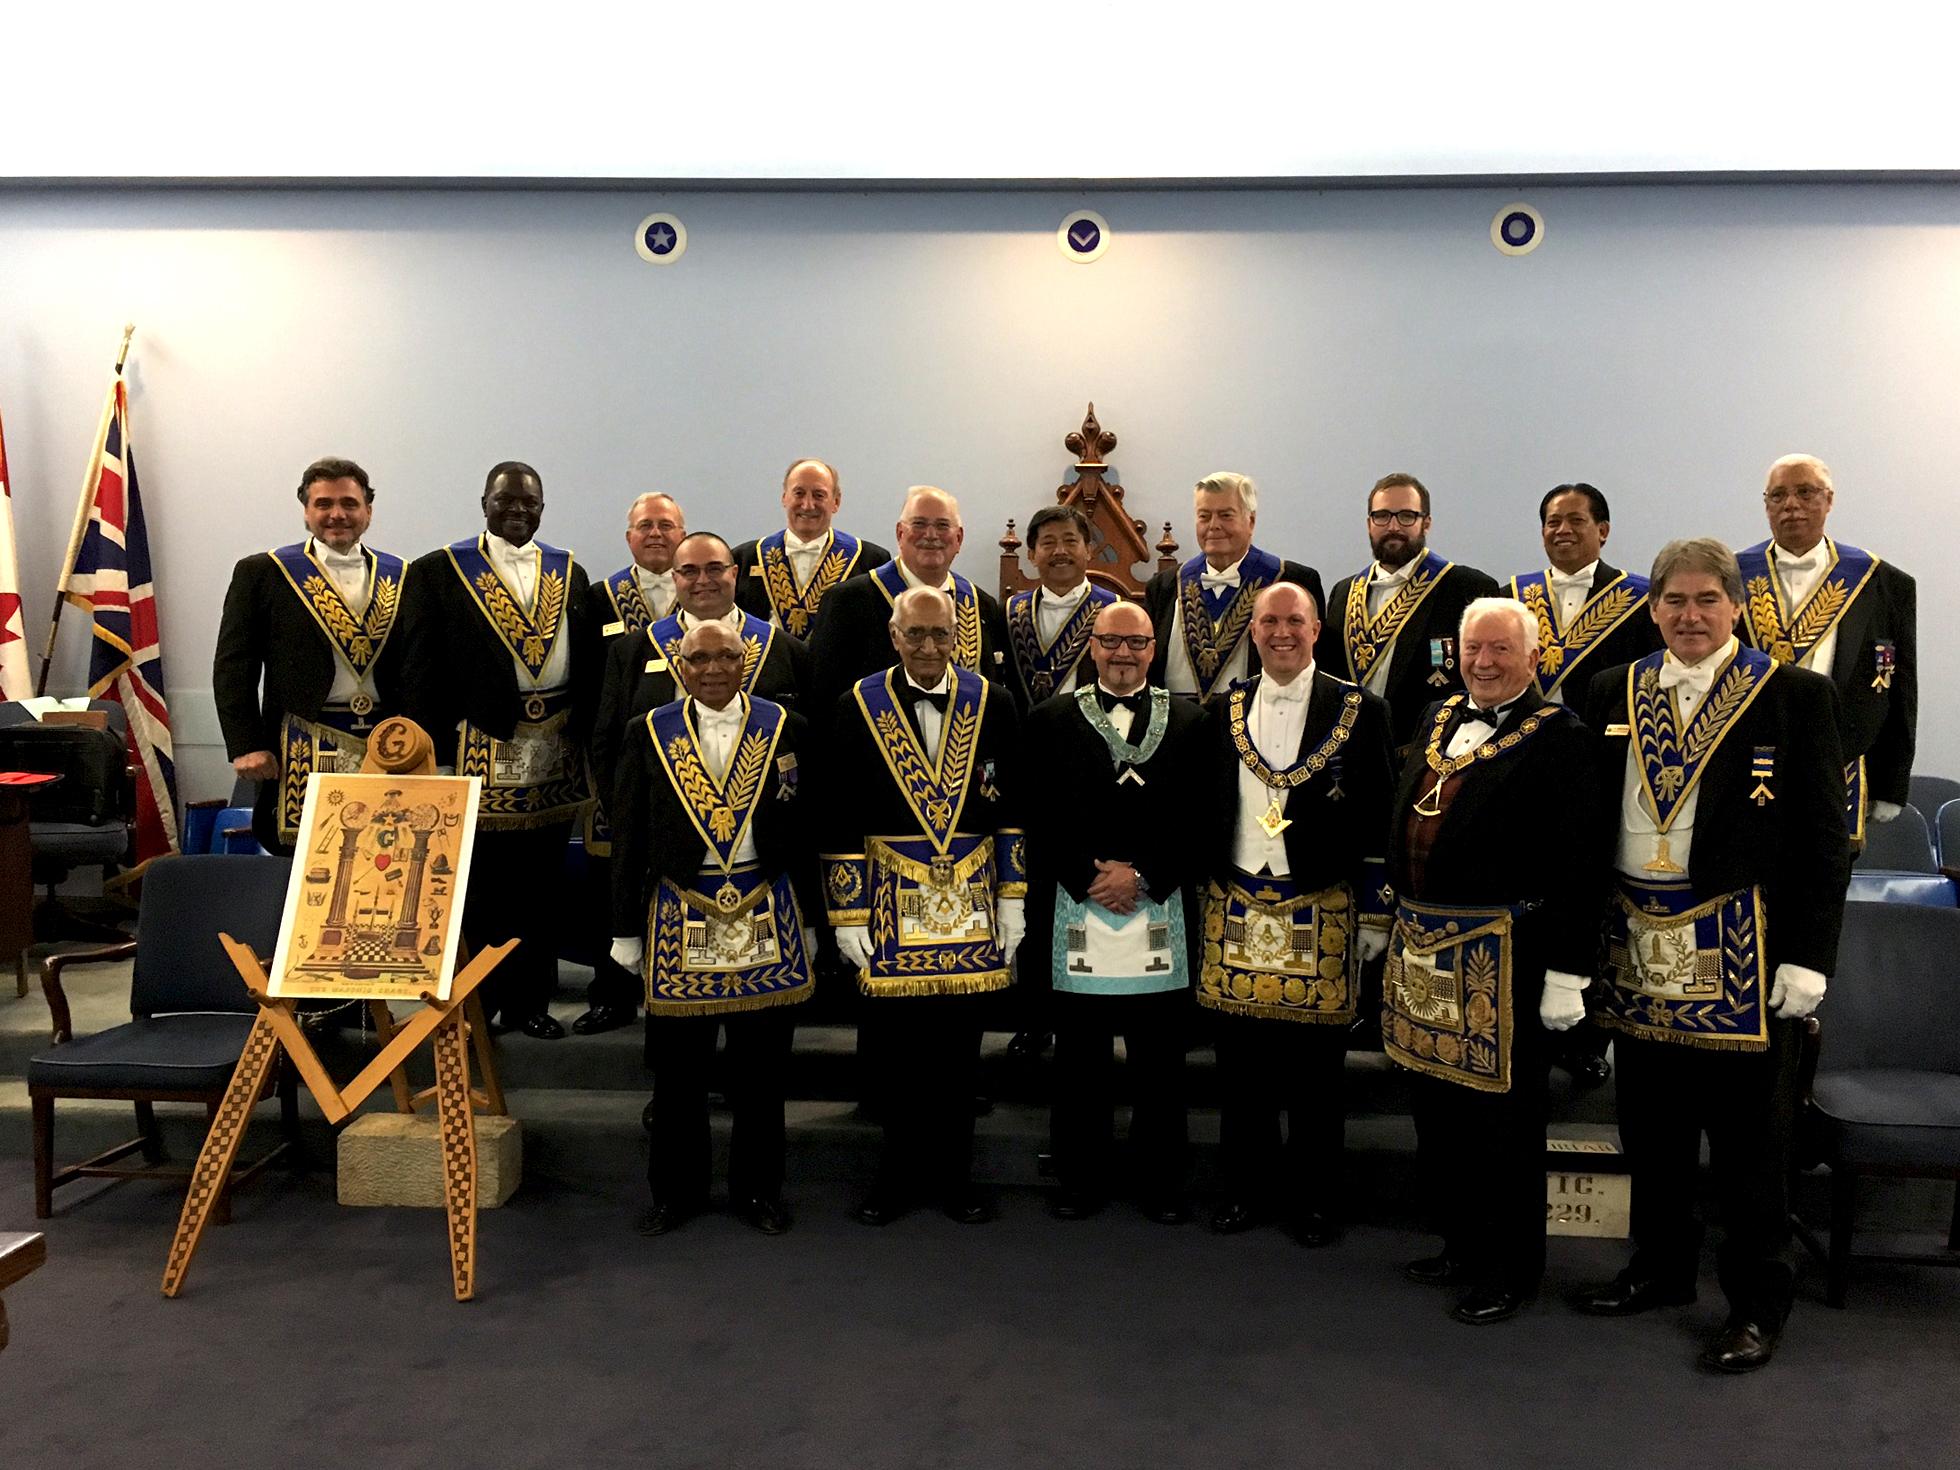 Grand Lodge Night - Chinguacousy